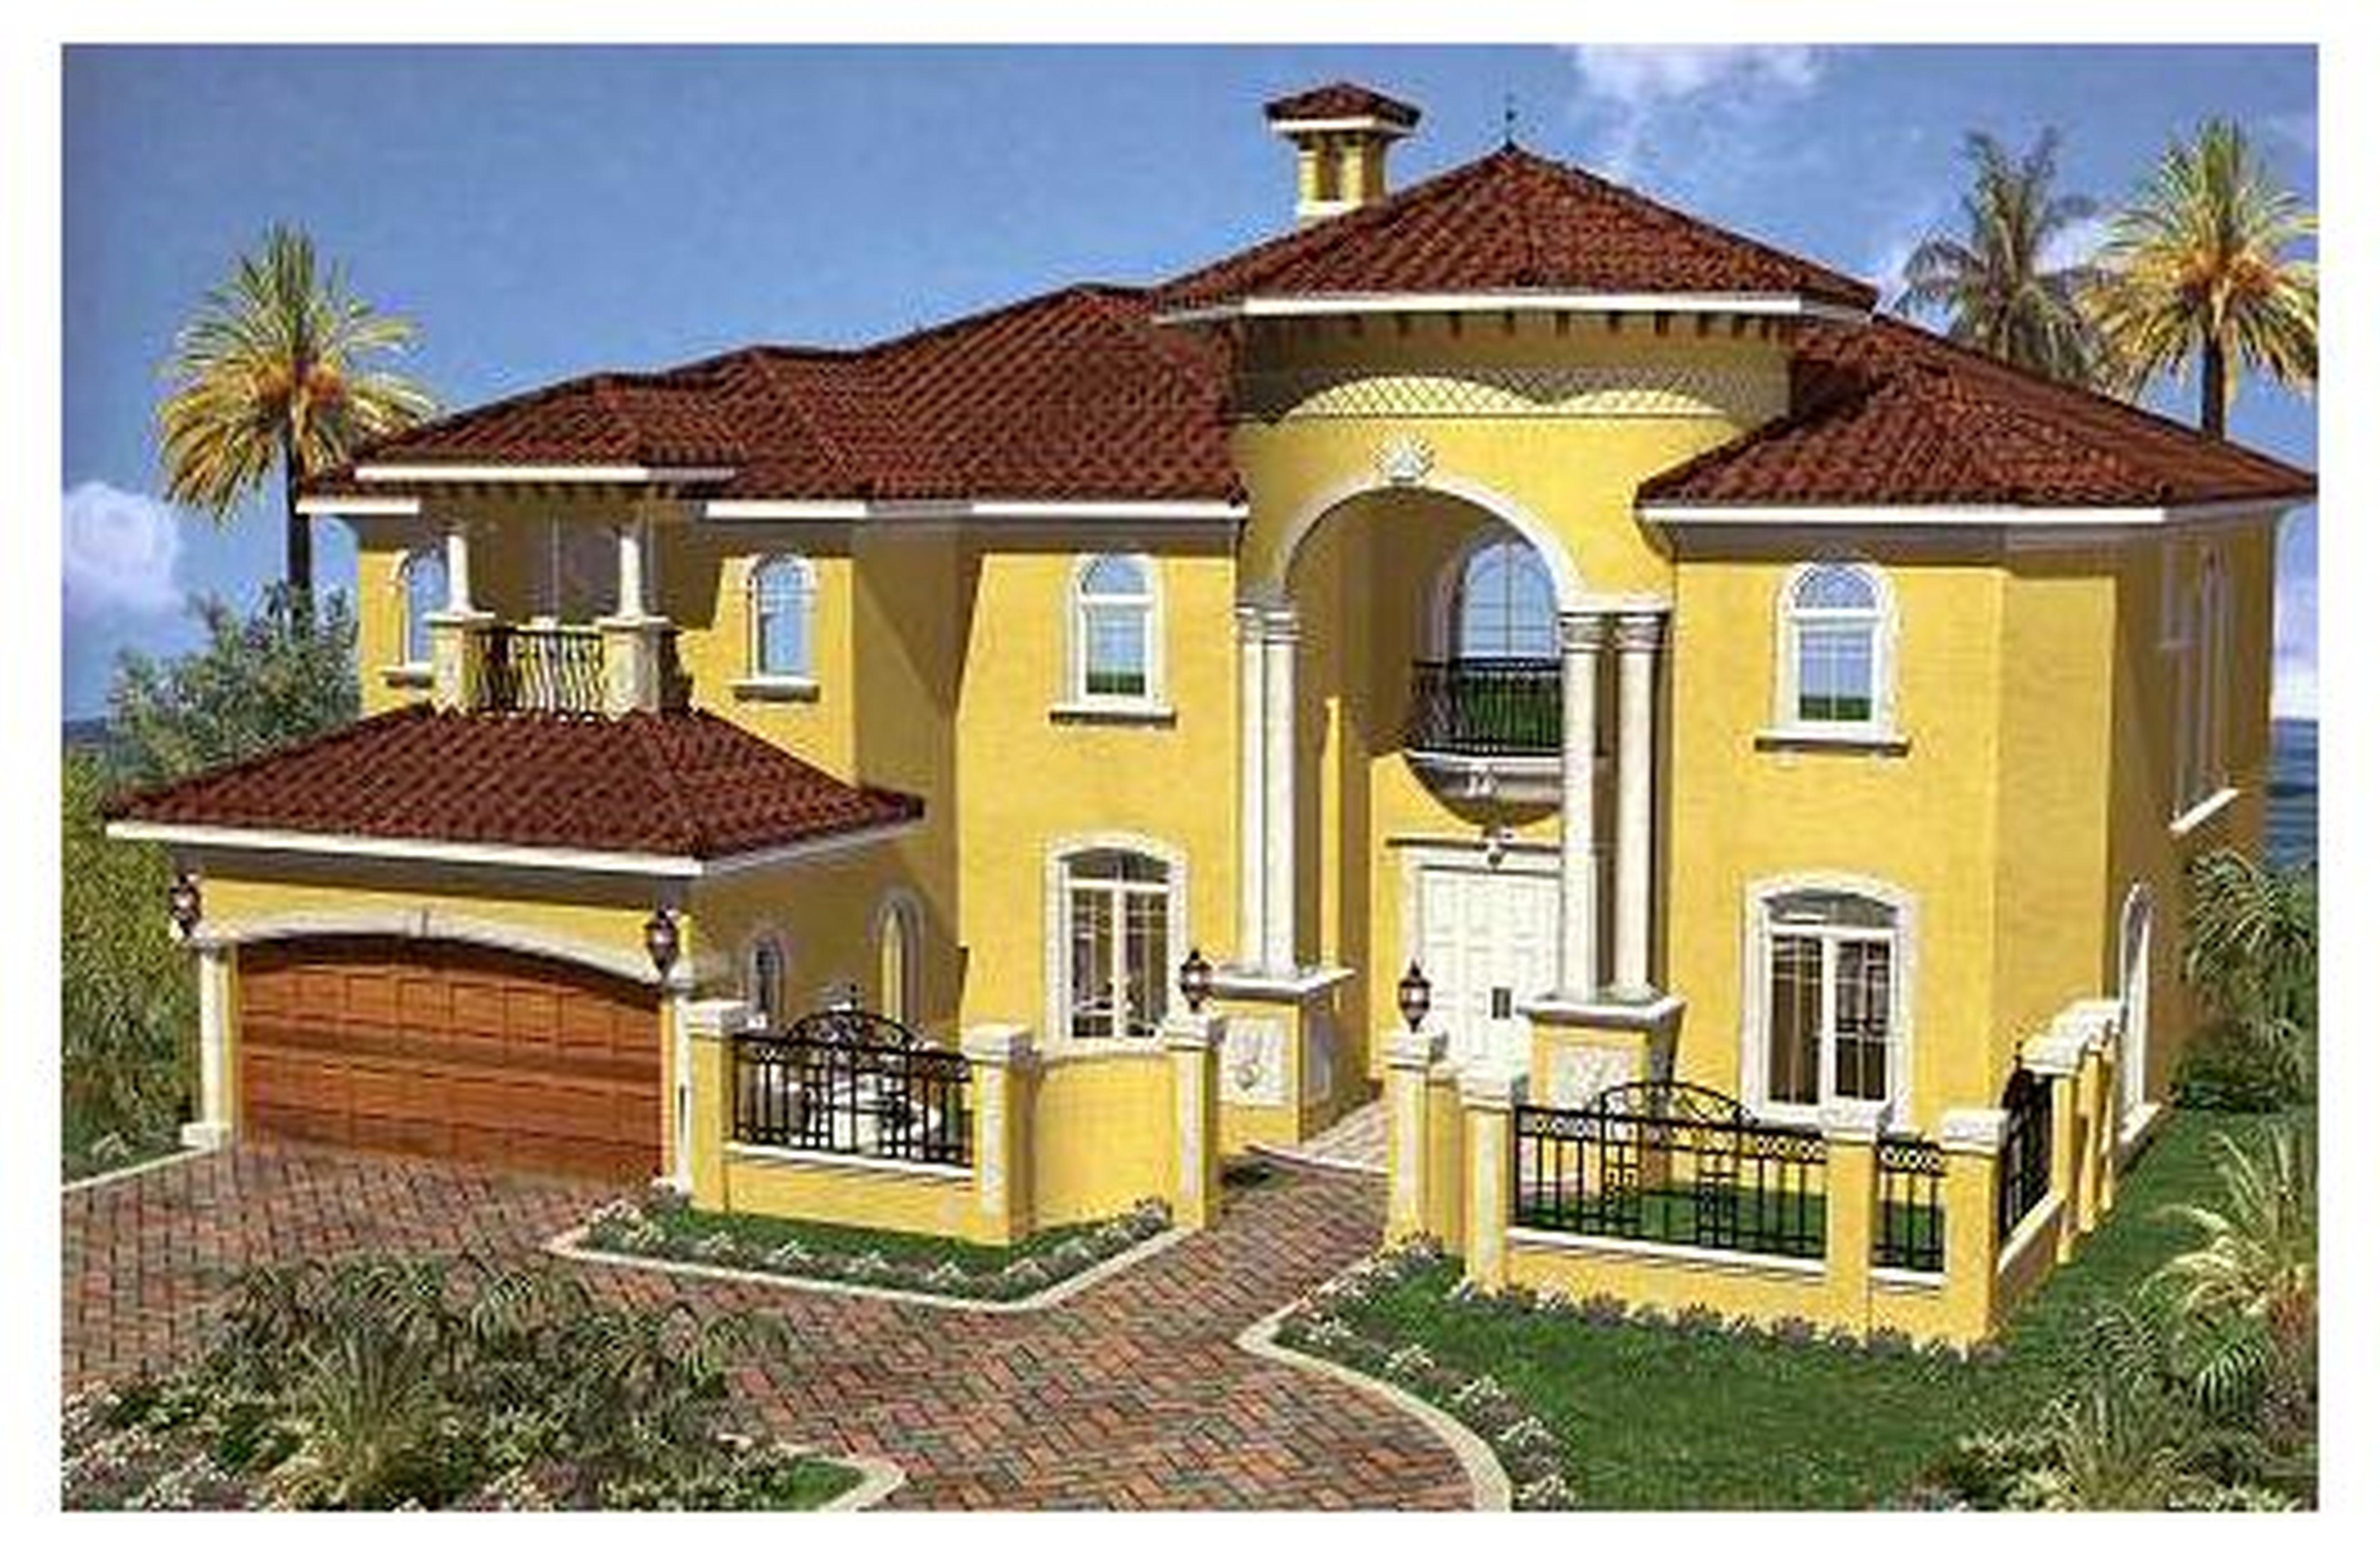 Best Inspiring Small House Plans | Minecraft house designs ...